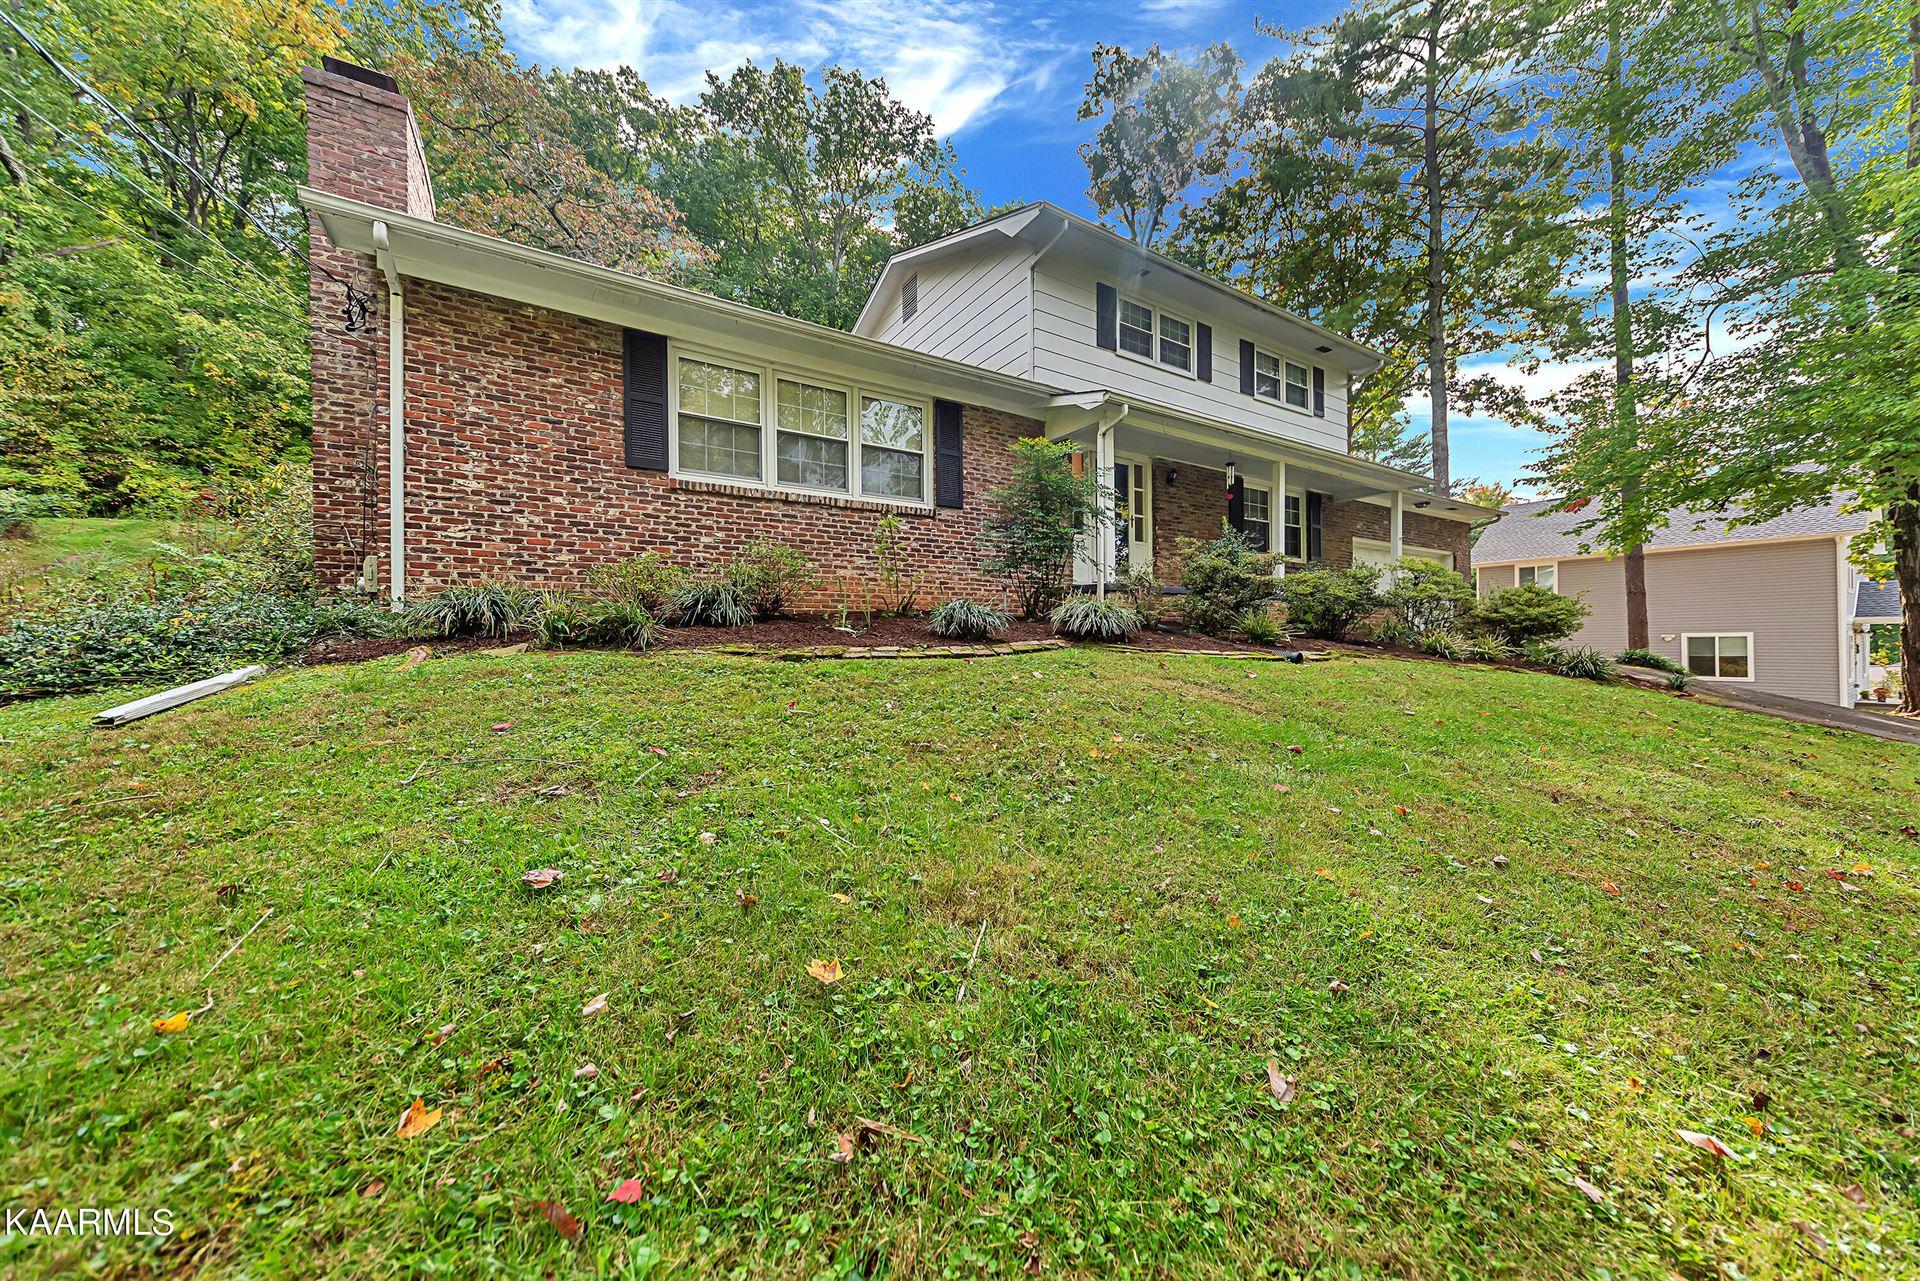 Photo of 3608 Cherrylog Rd, Knoxville, TN 37921 (MLS # 1171786)